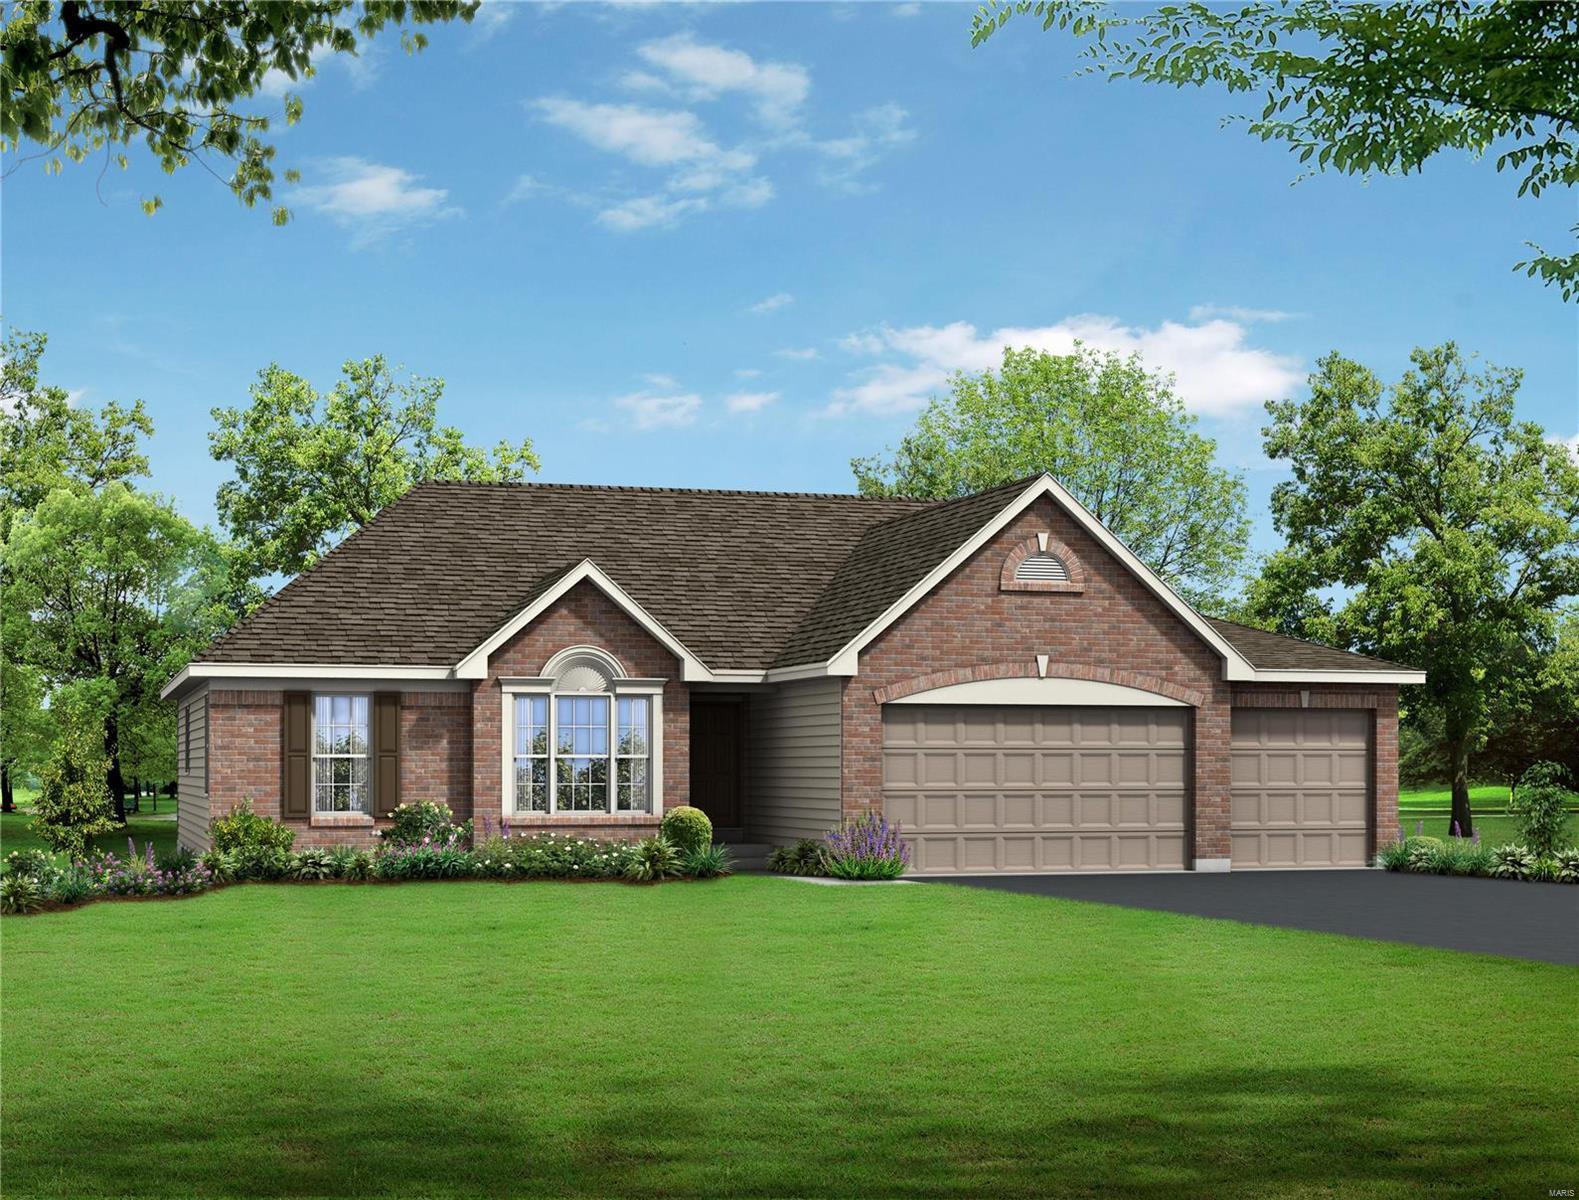 2 Arbors / Stratford Model Property Photo - Eureka, MO real estate listing